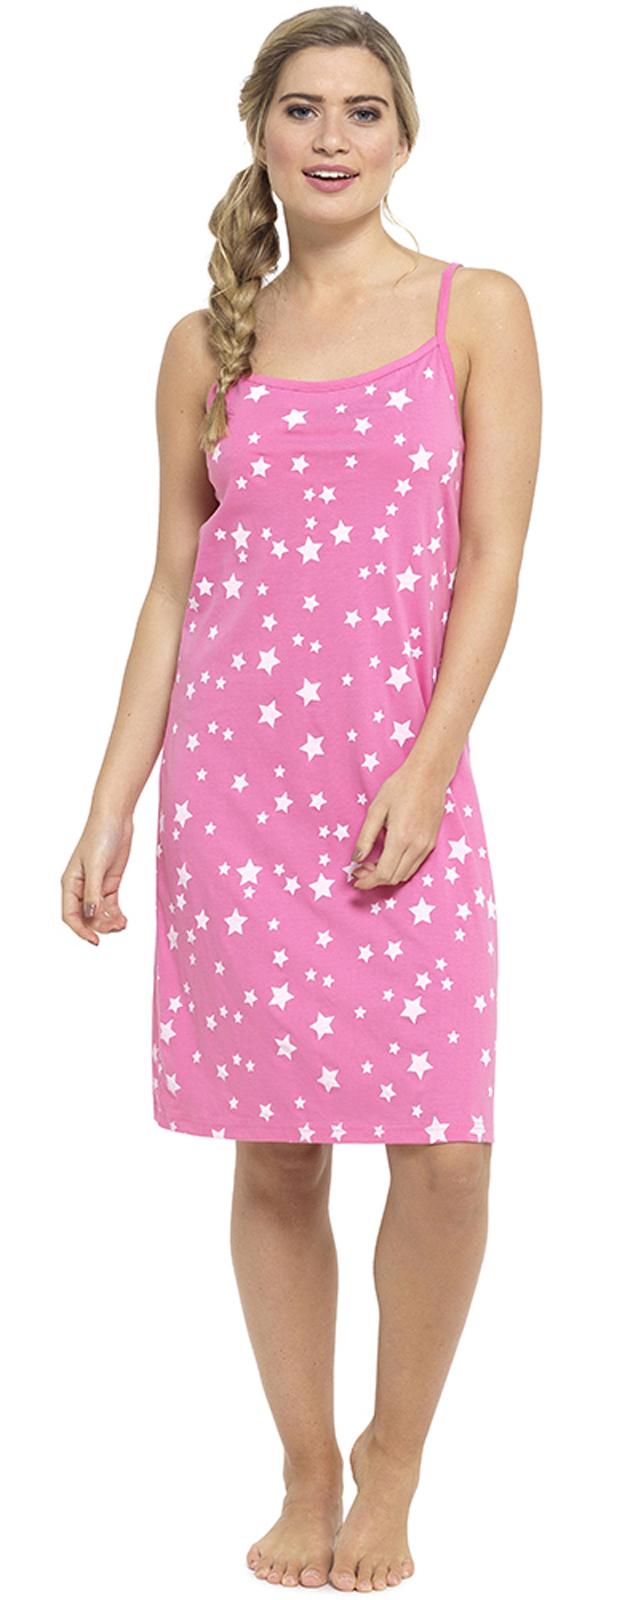 130fbcbf20897 Womens Nightdress Chemise Strappy Nightie 100% Cotton